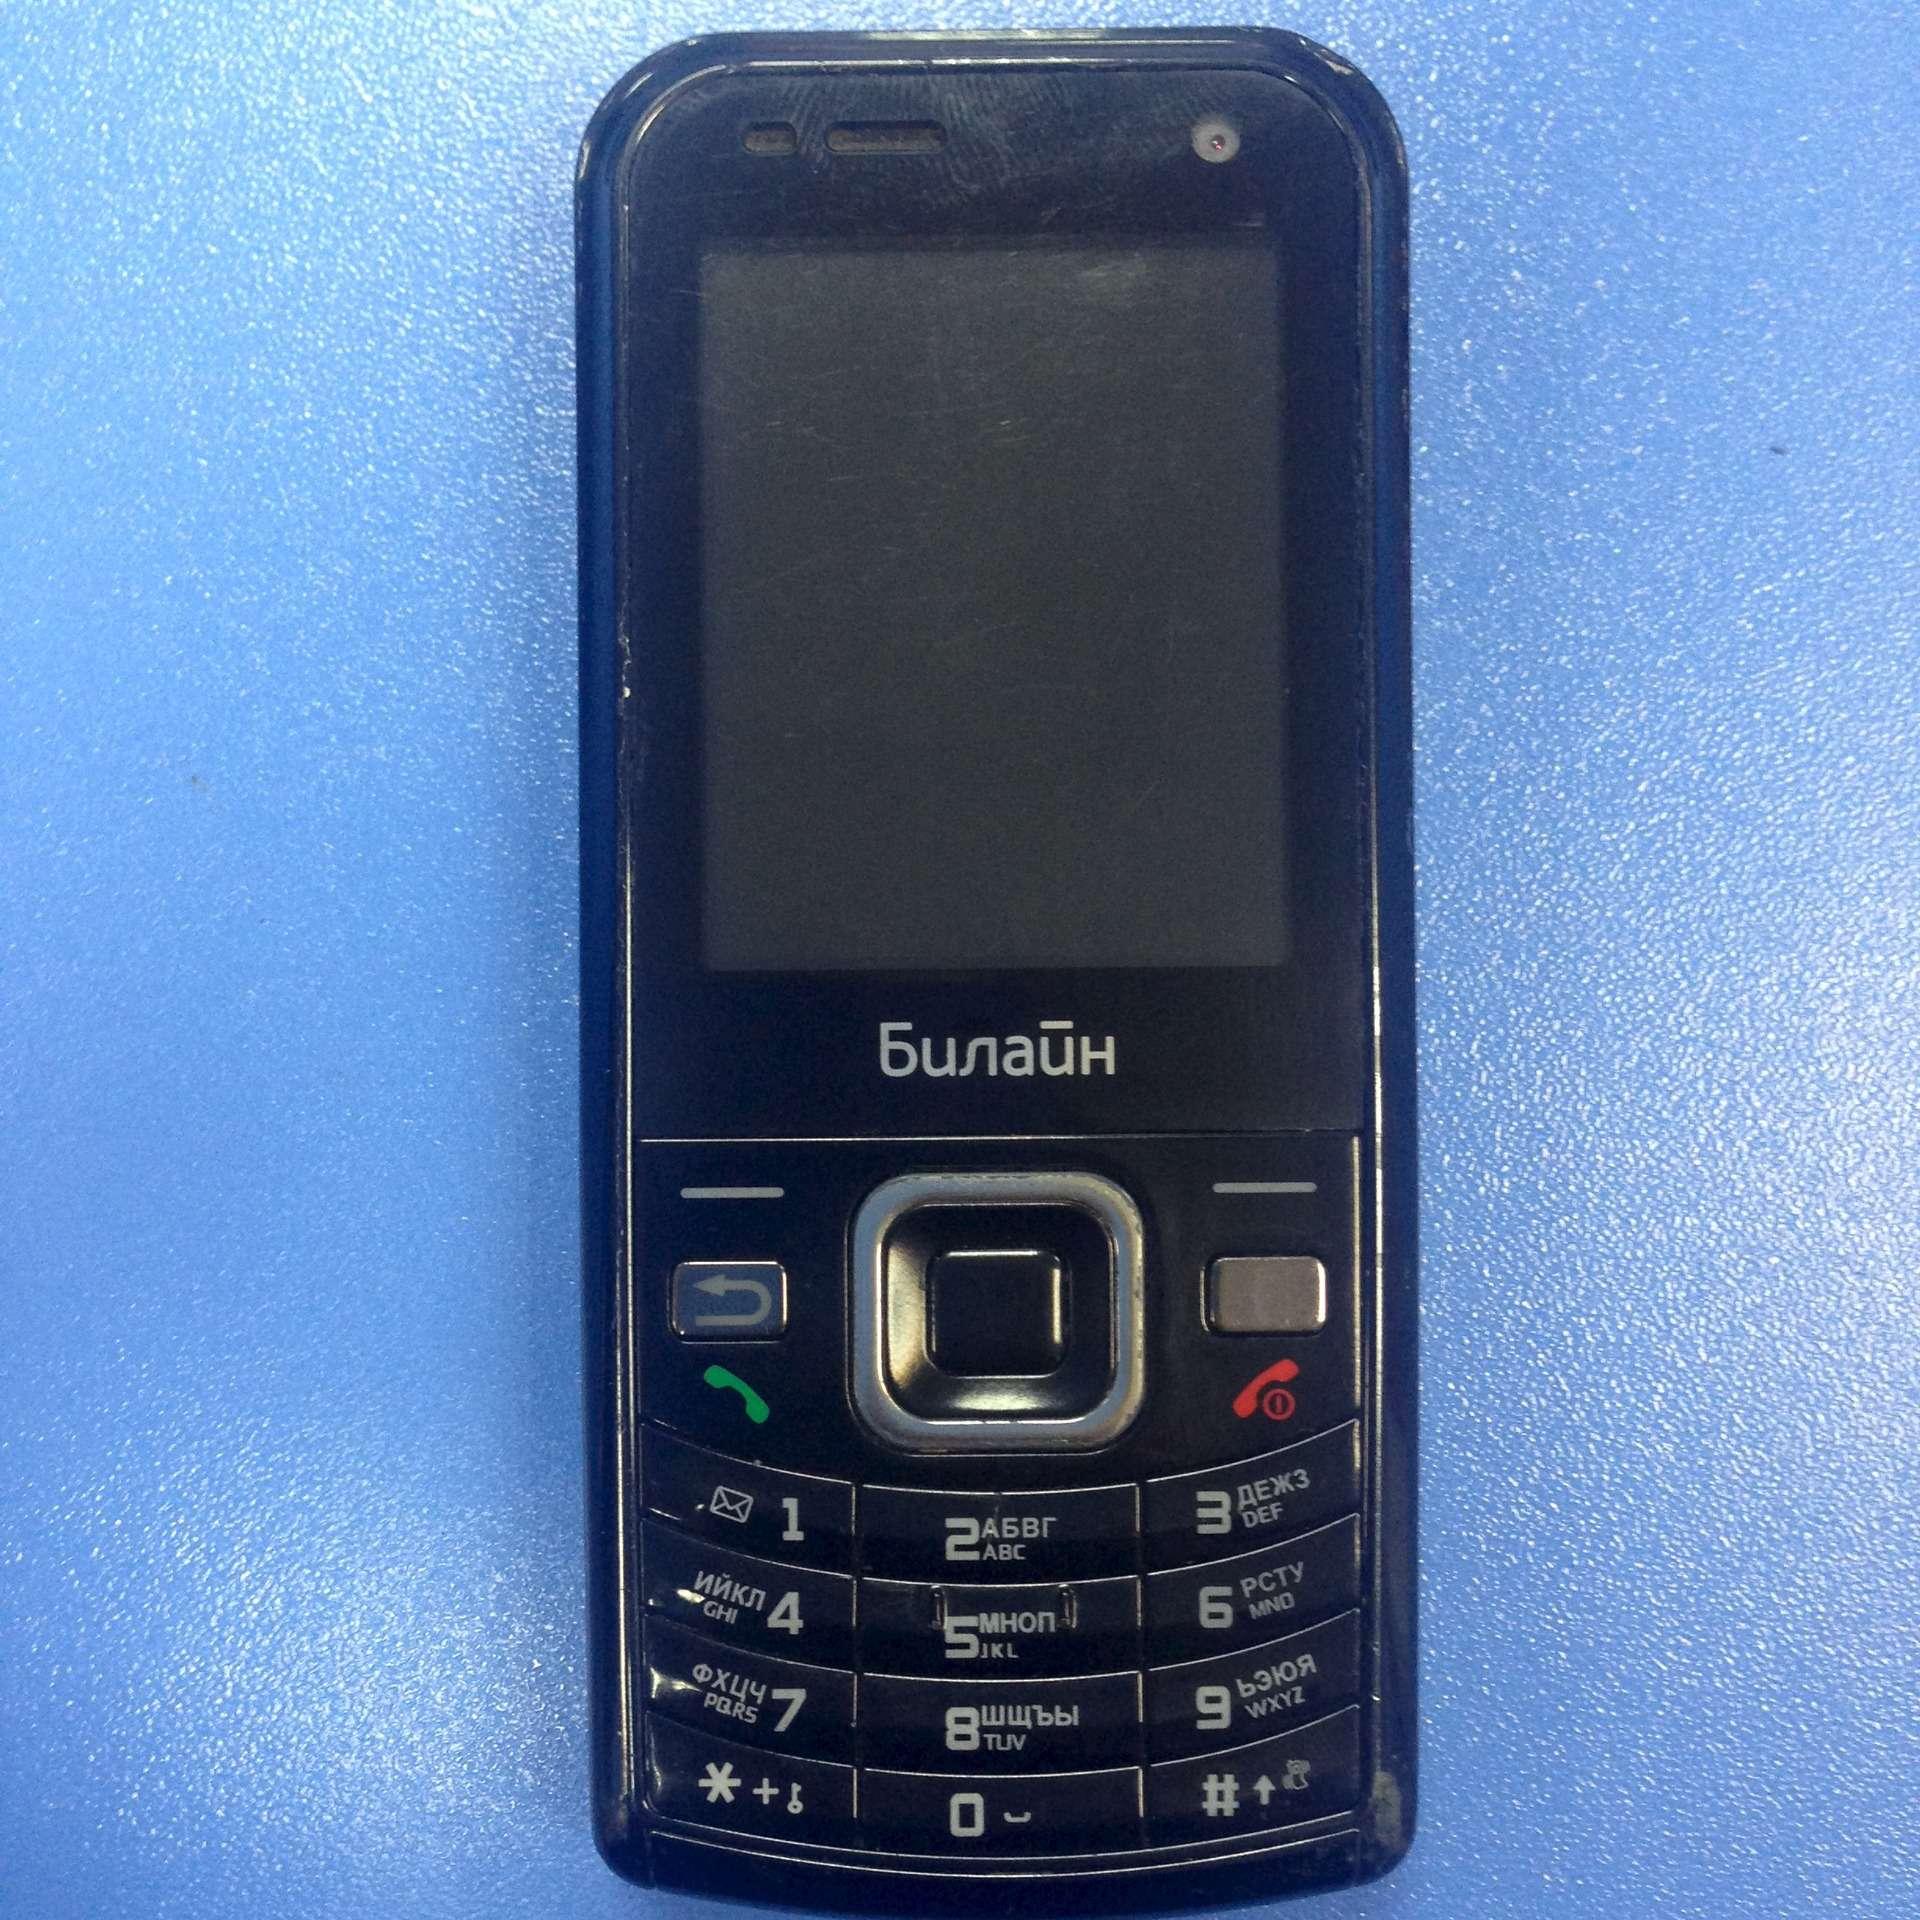 Продам чехол для телефона samsung e200 oneplus one mini 4pda